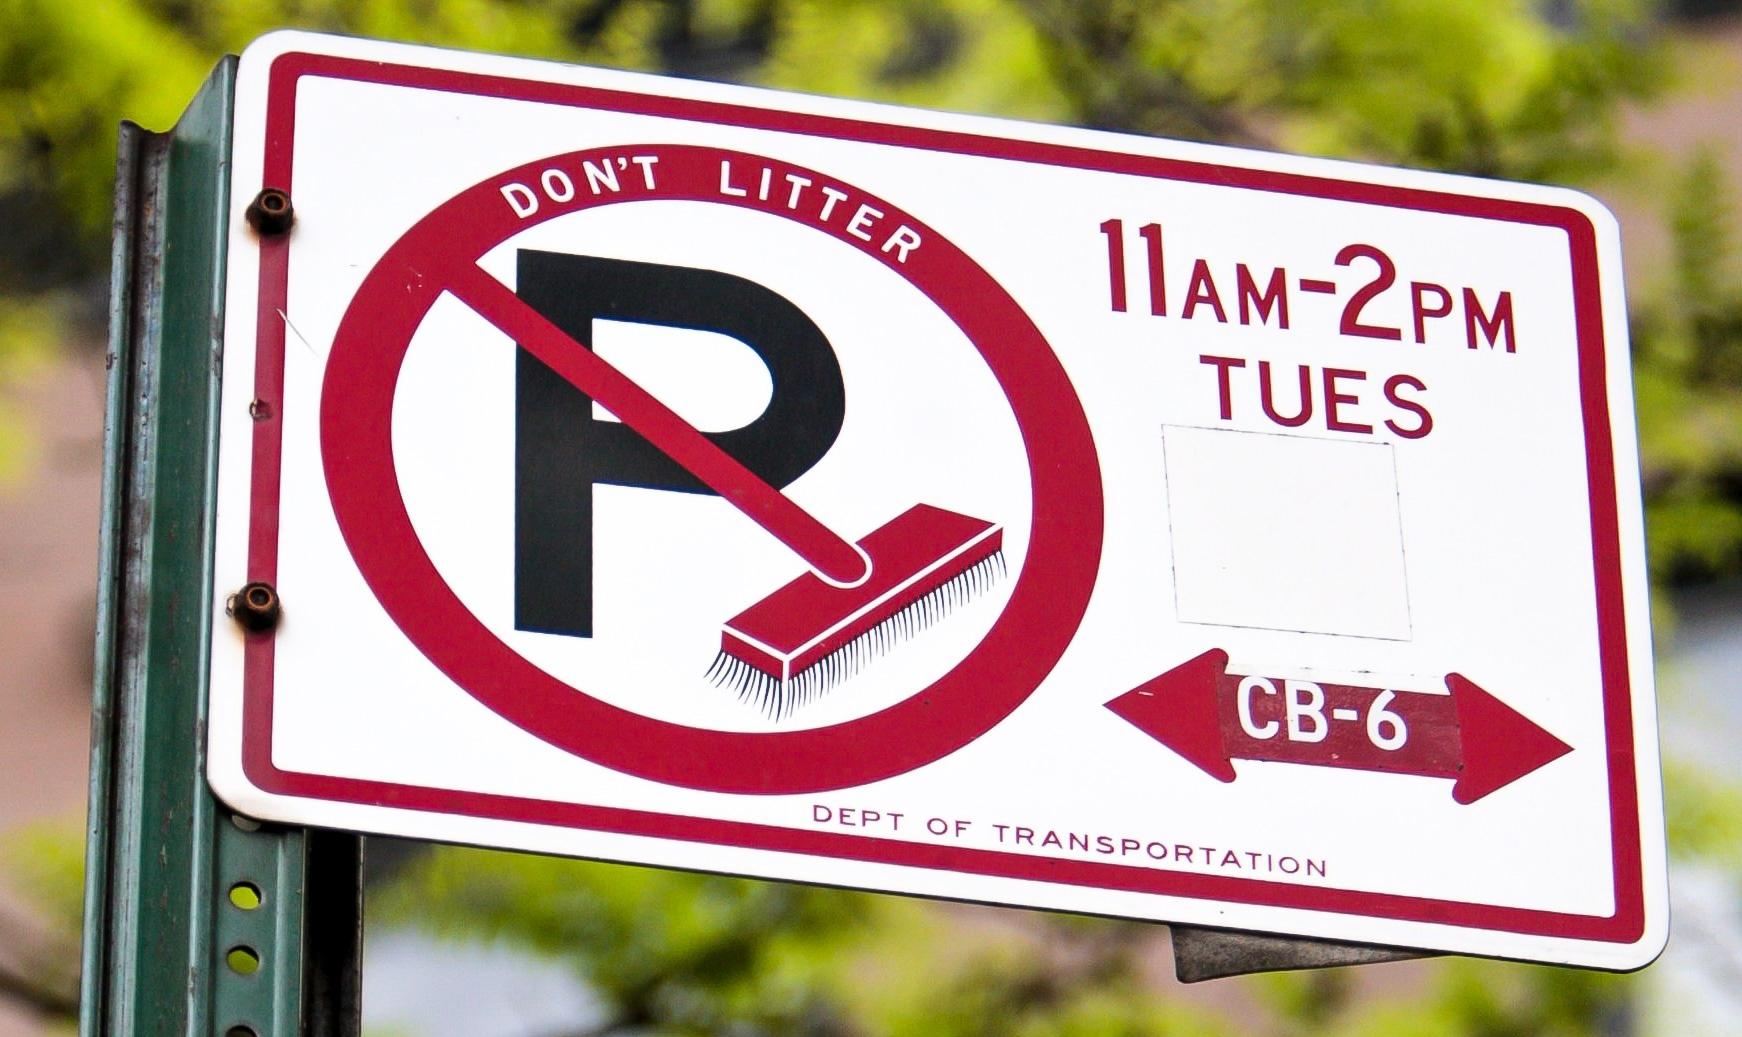 Nyc Alternate Parking Calendar | Printable Calendar 2020-2021 Alternate Side Parking Suspension 2021